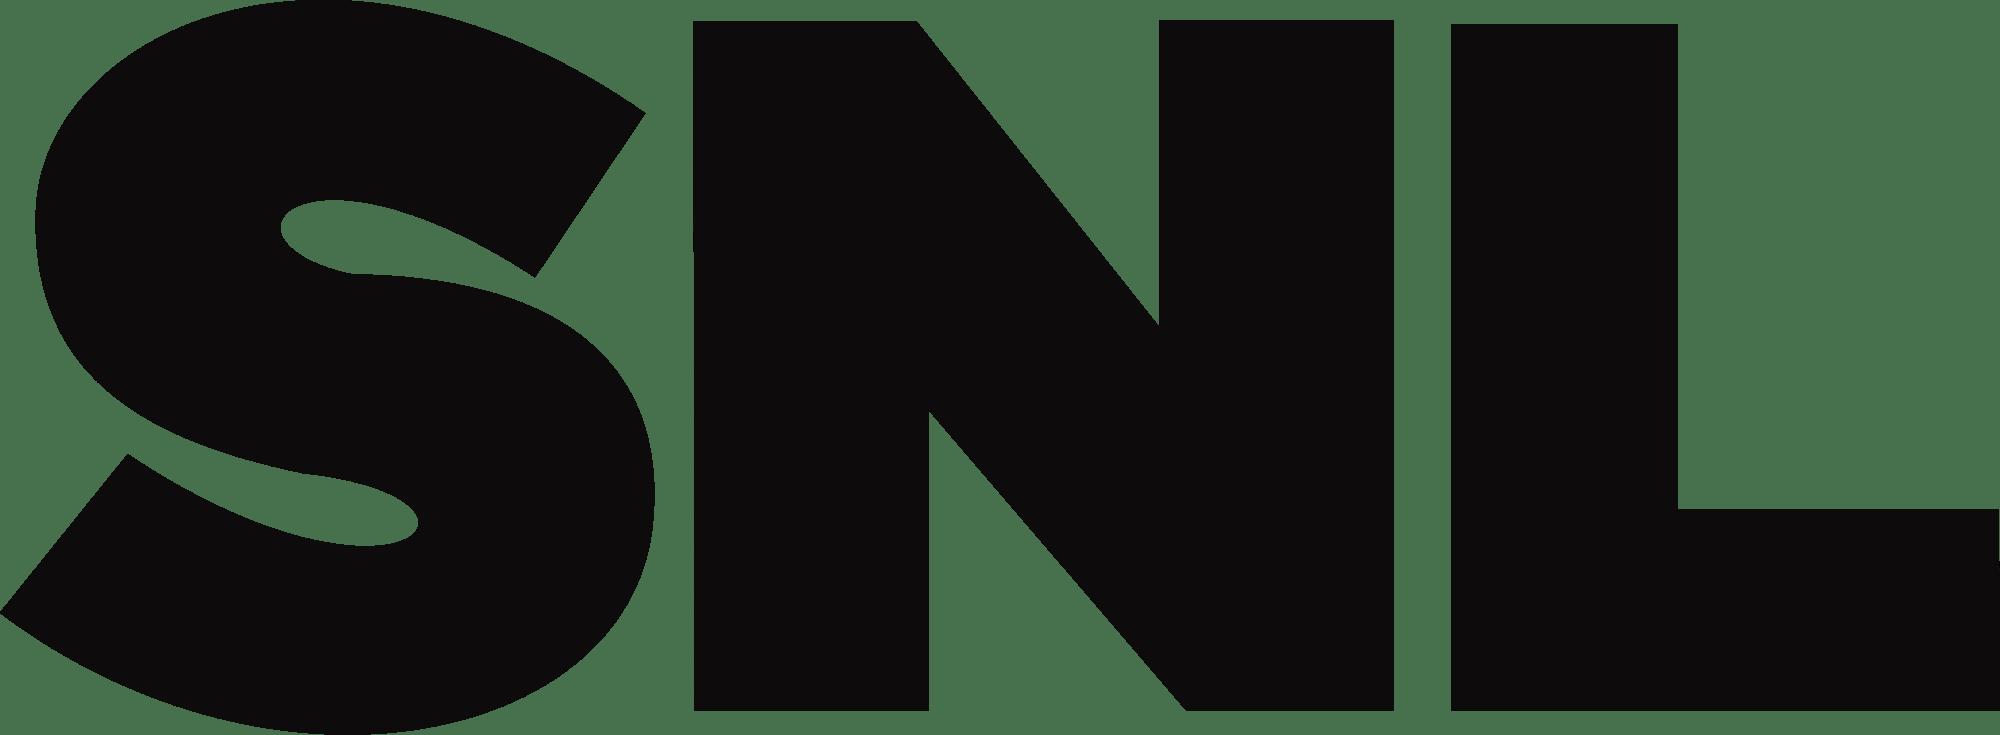 2000px-logo_of_snl-svg